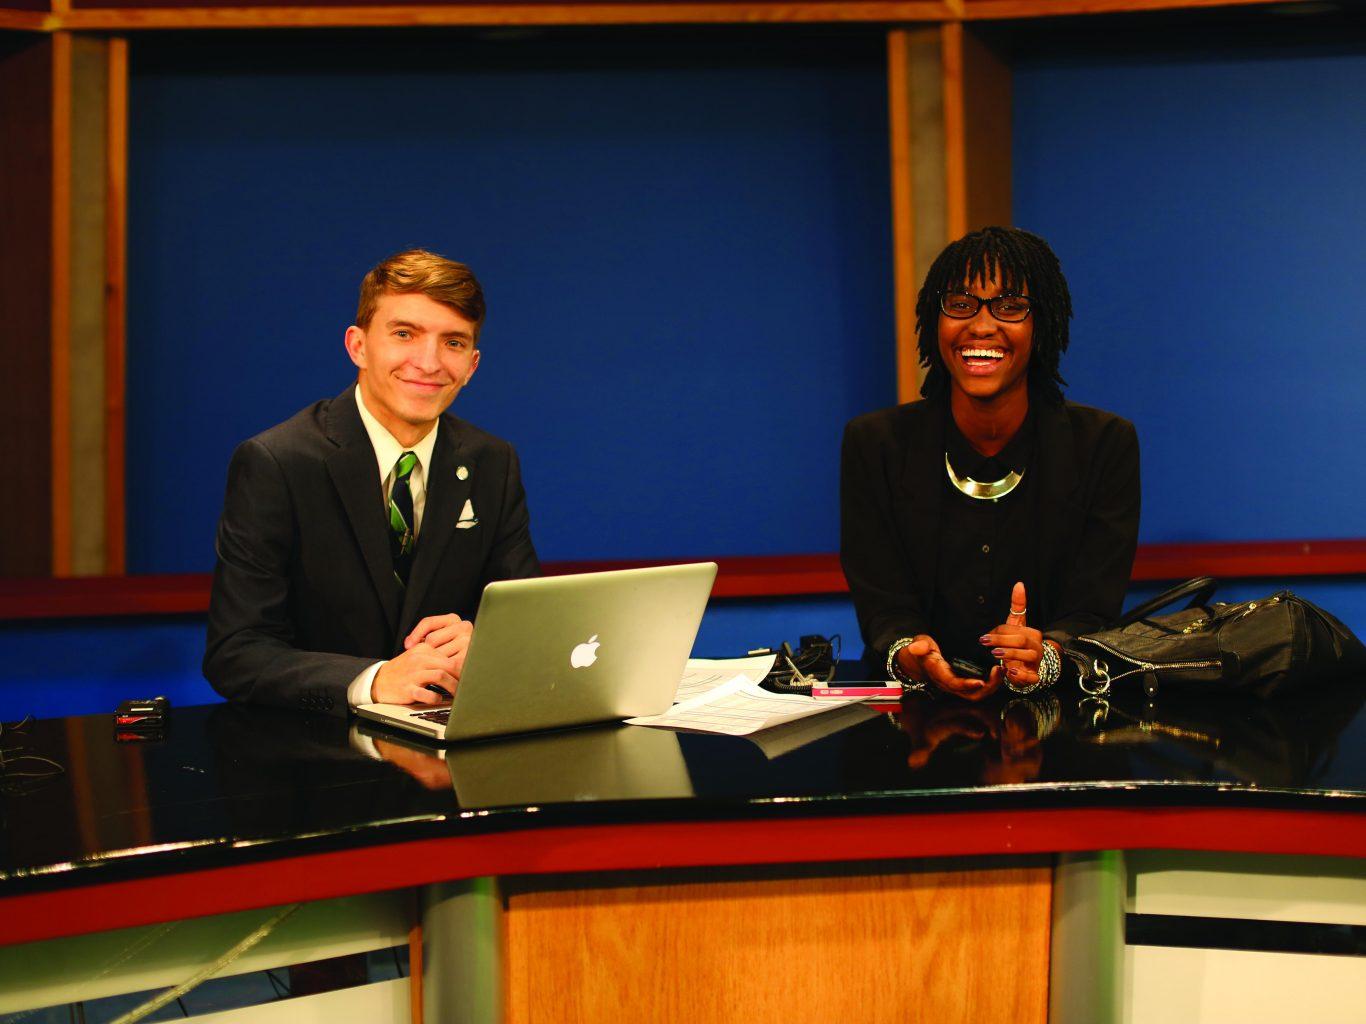 Students Preparing News Broadcast